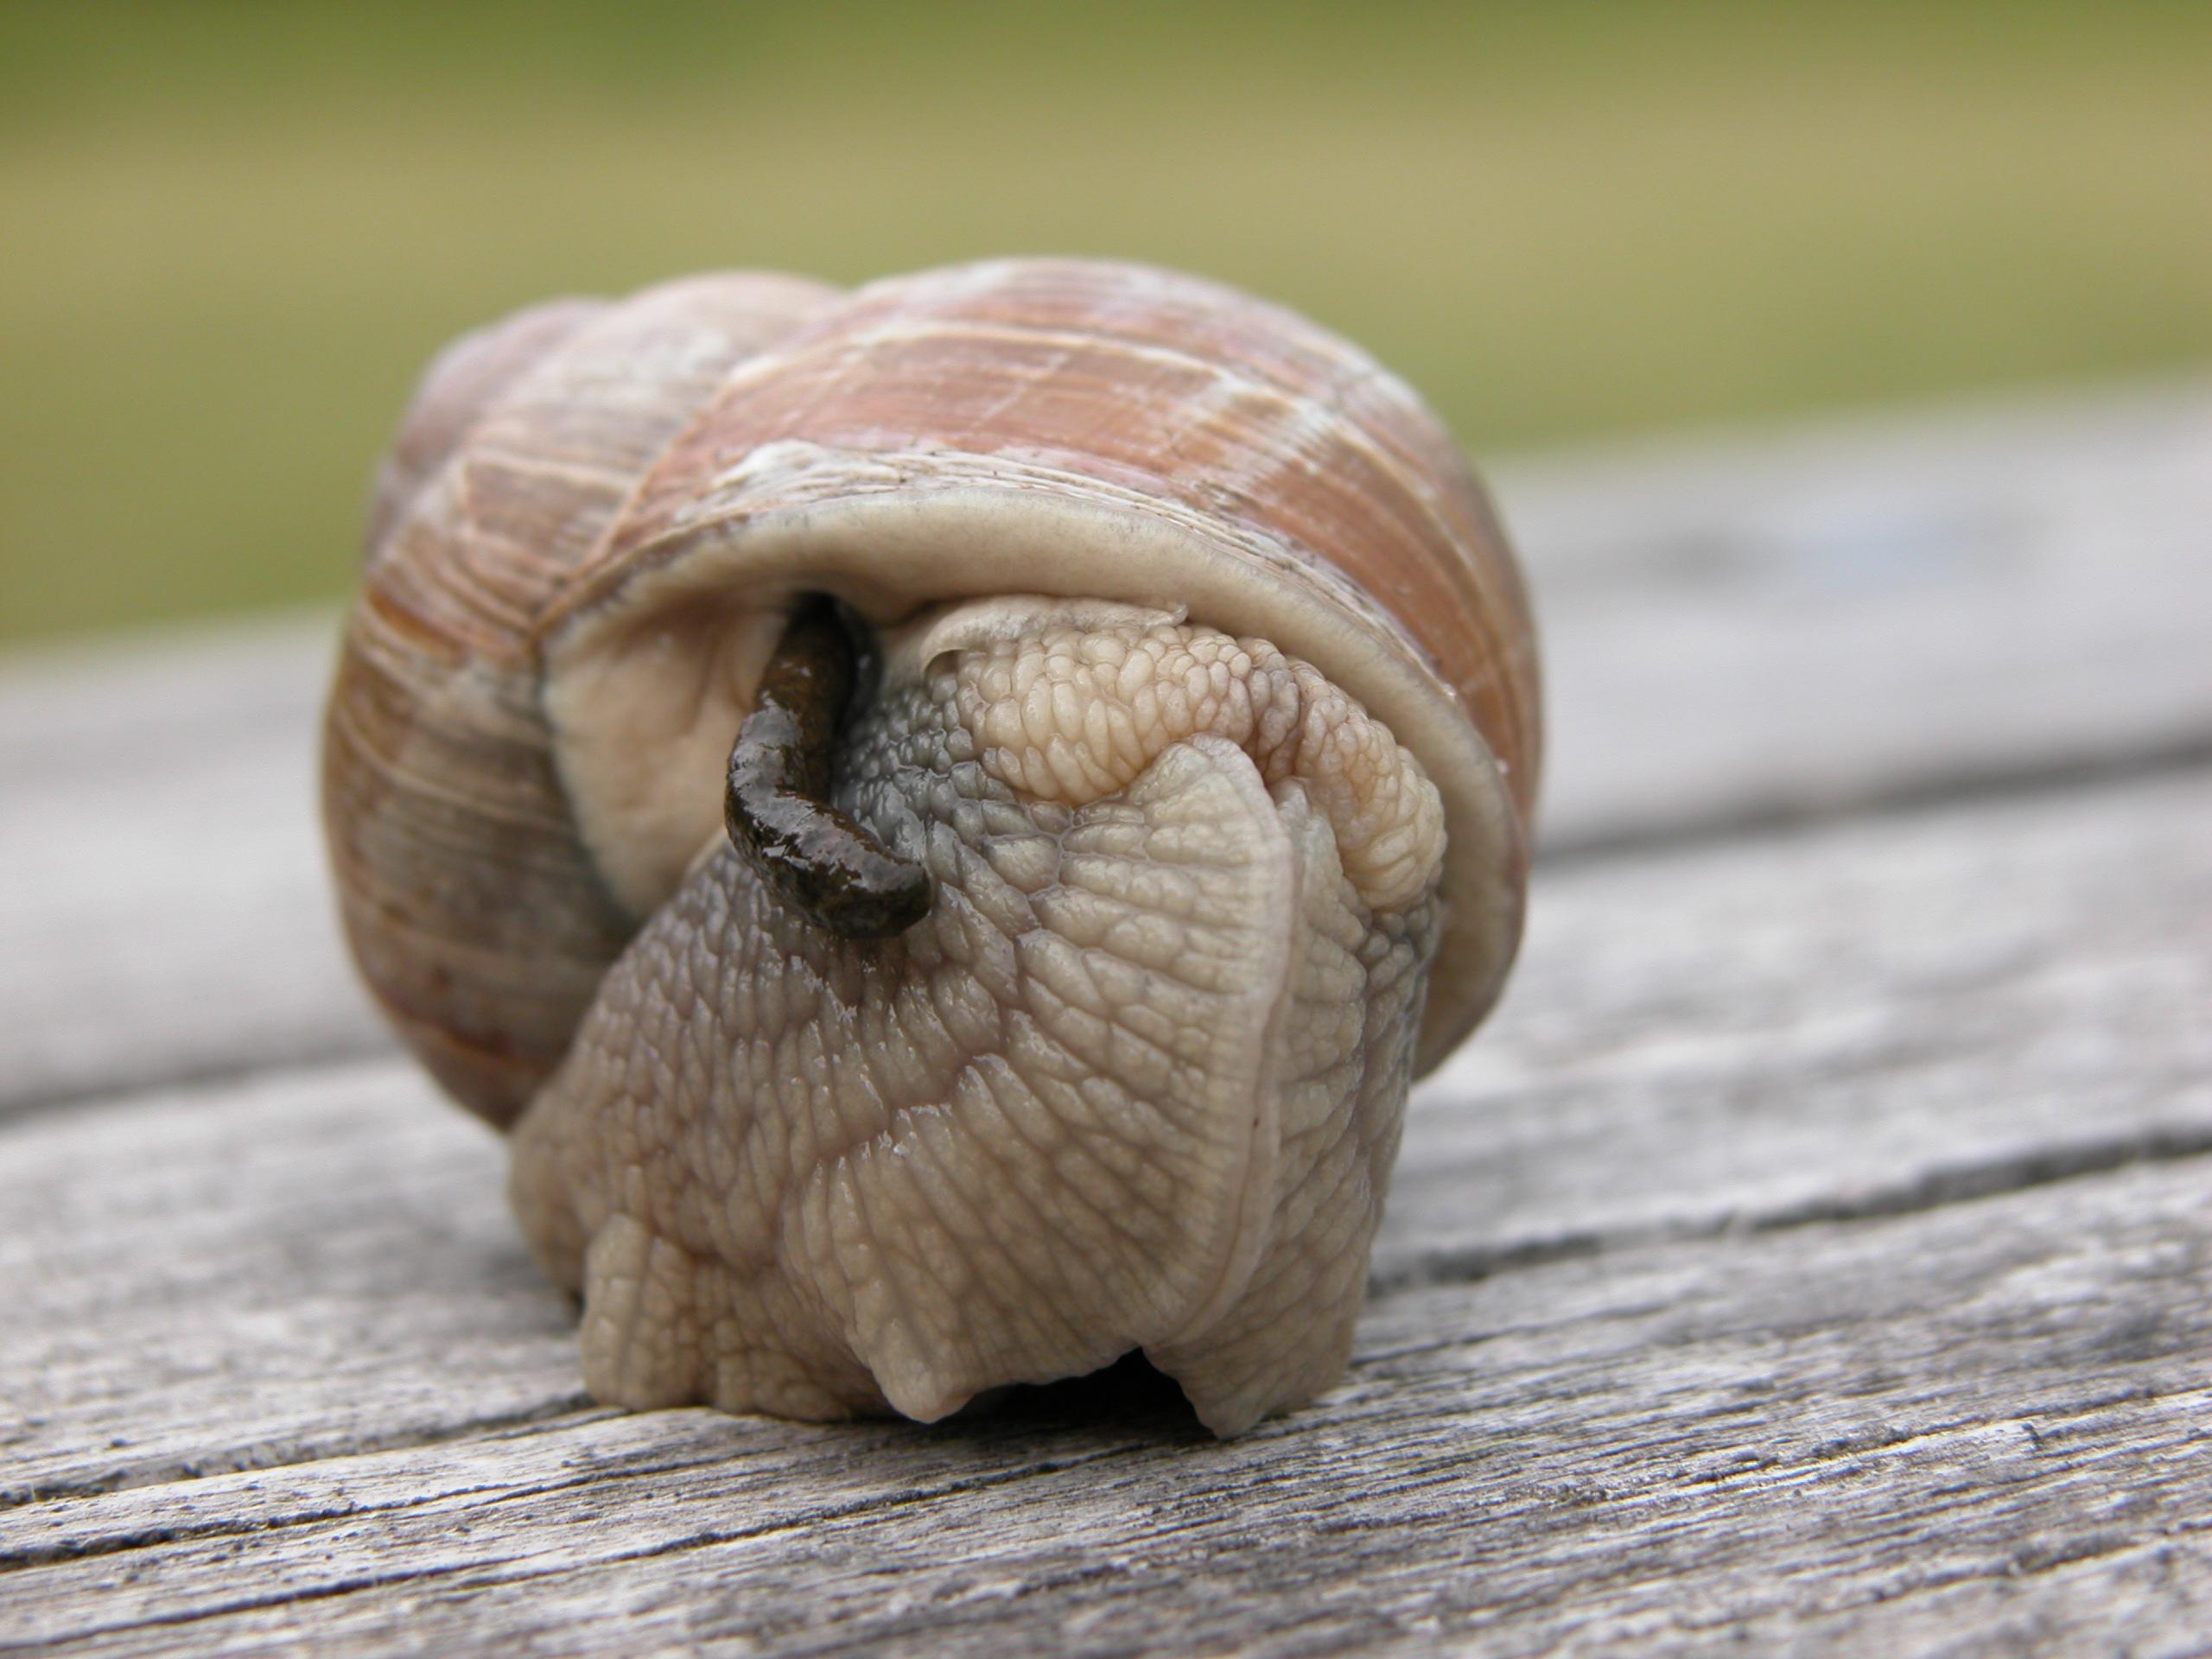 snail insect invertebrates slime slow